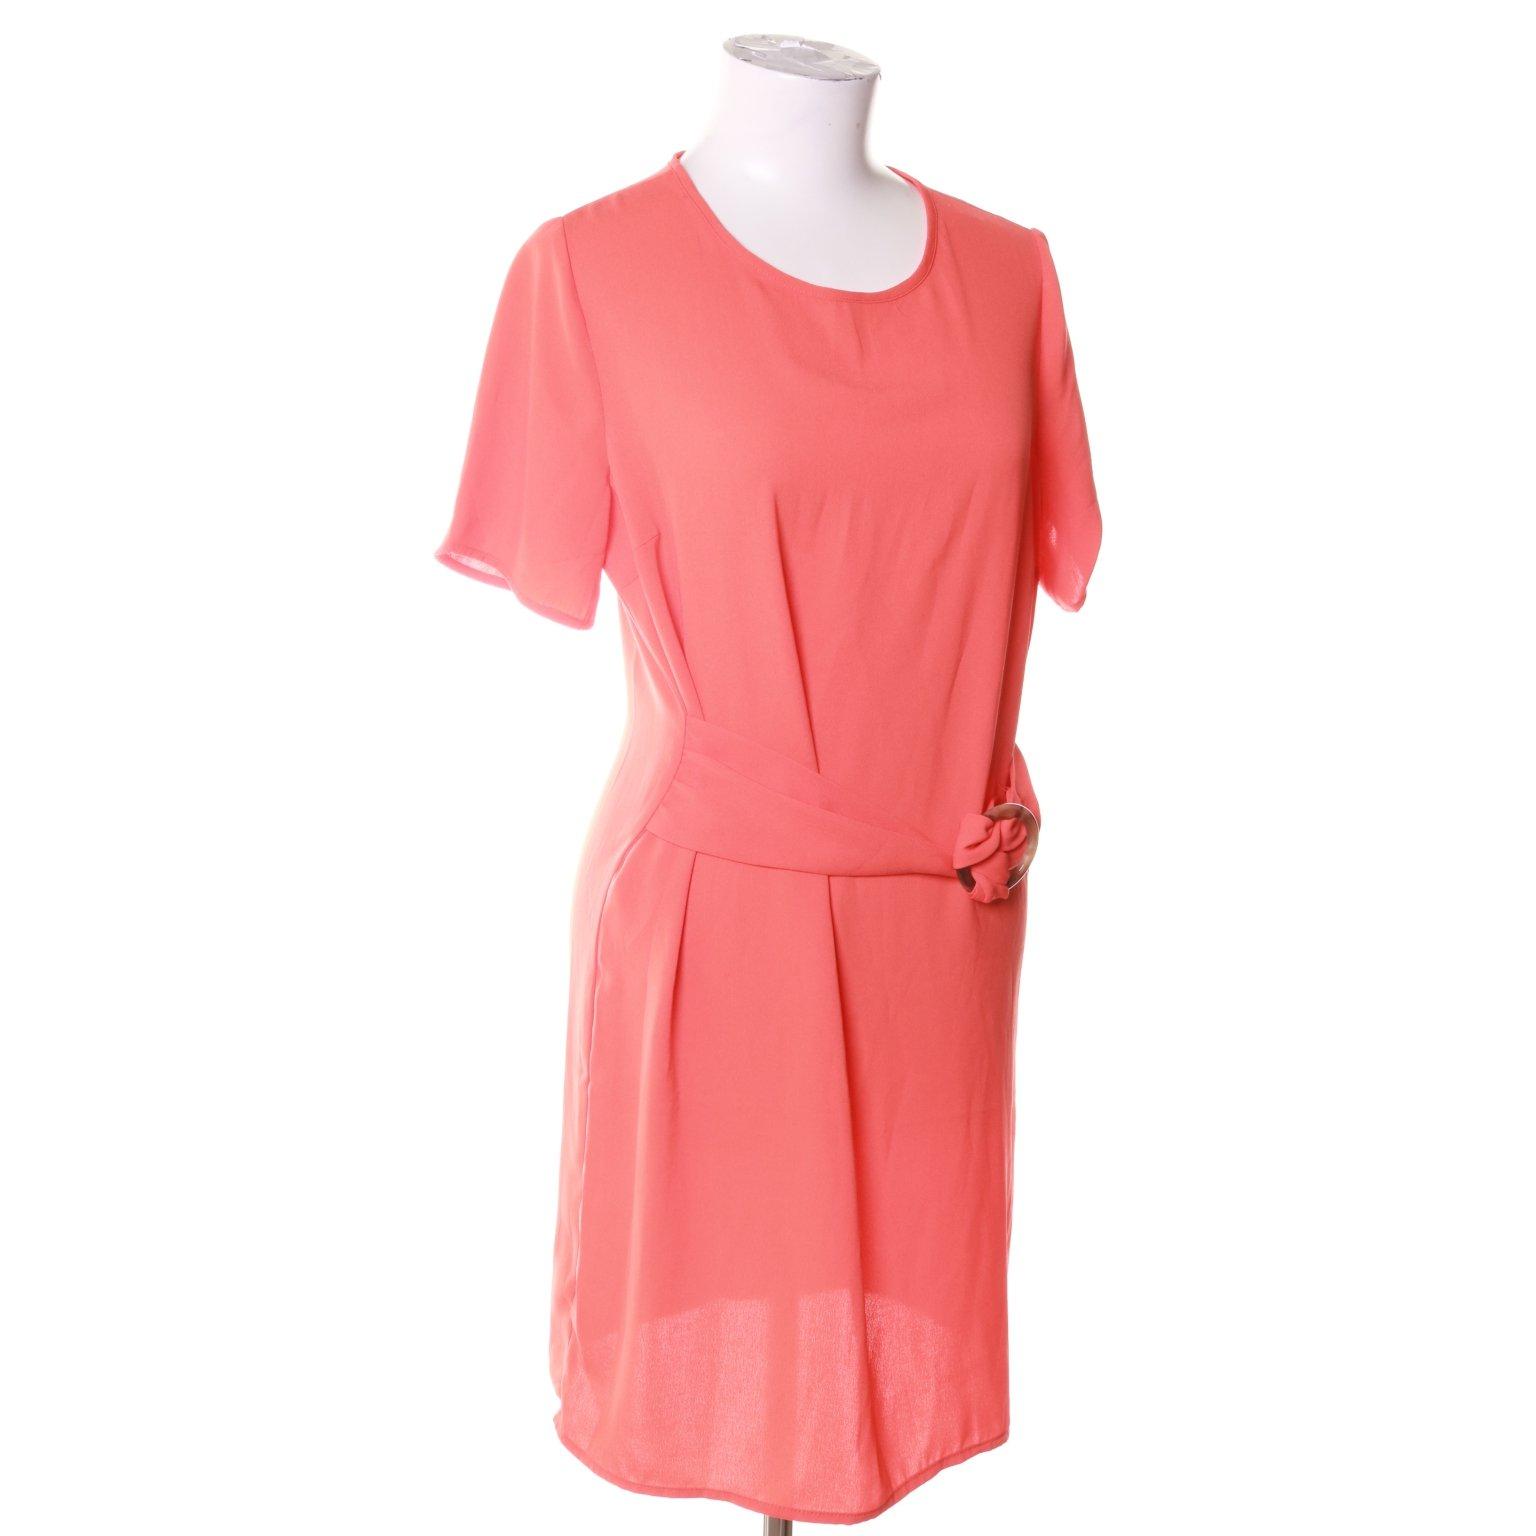 Pieces, Klänning, Strl: S, Clisa dress, O.. (379088339) ᐈ